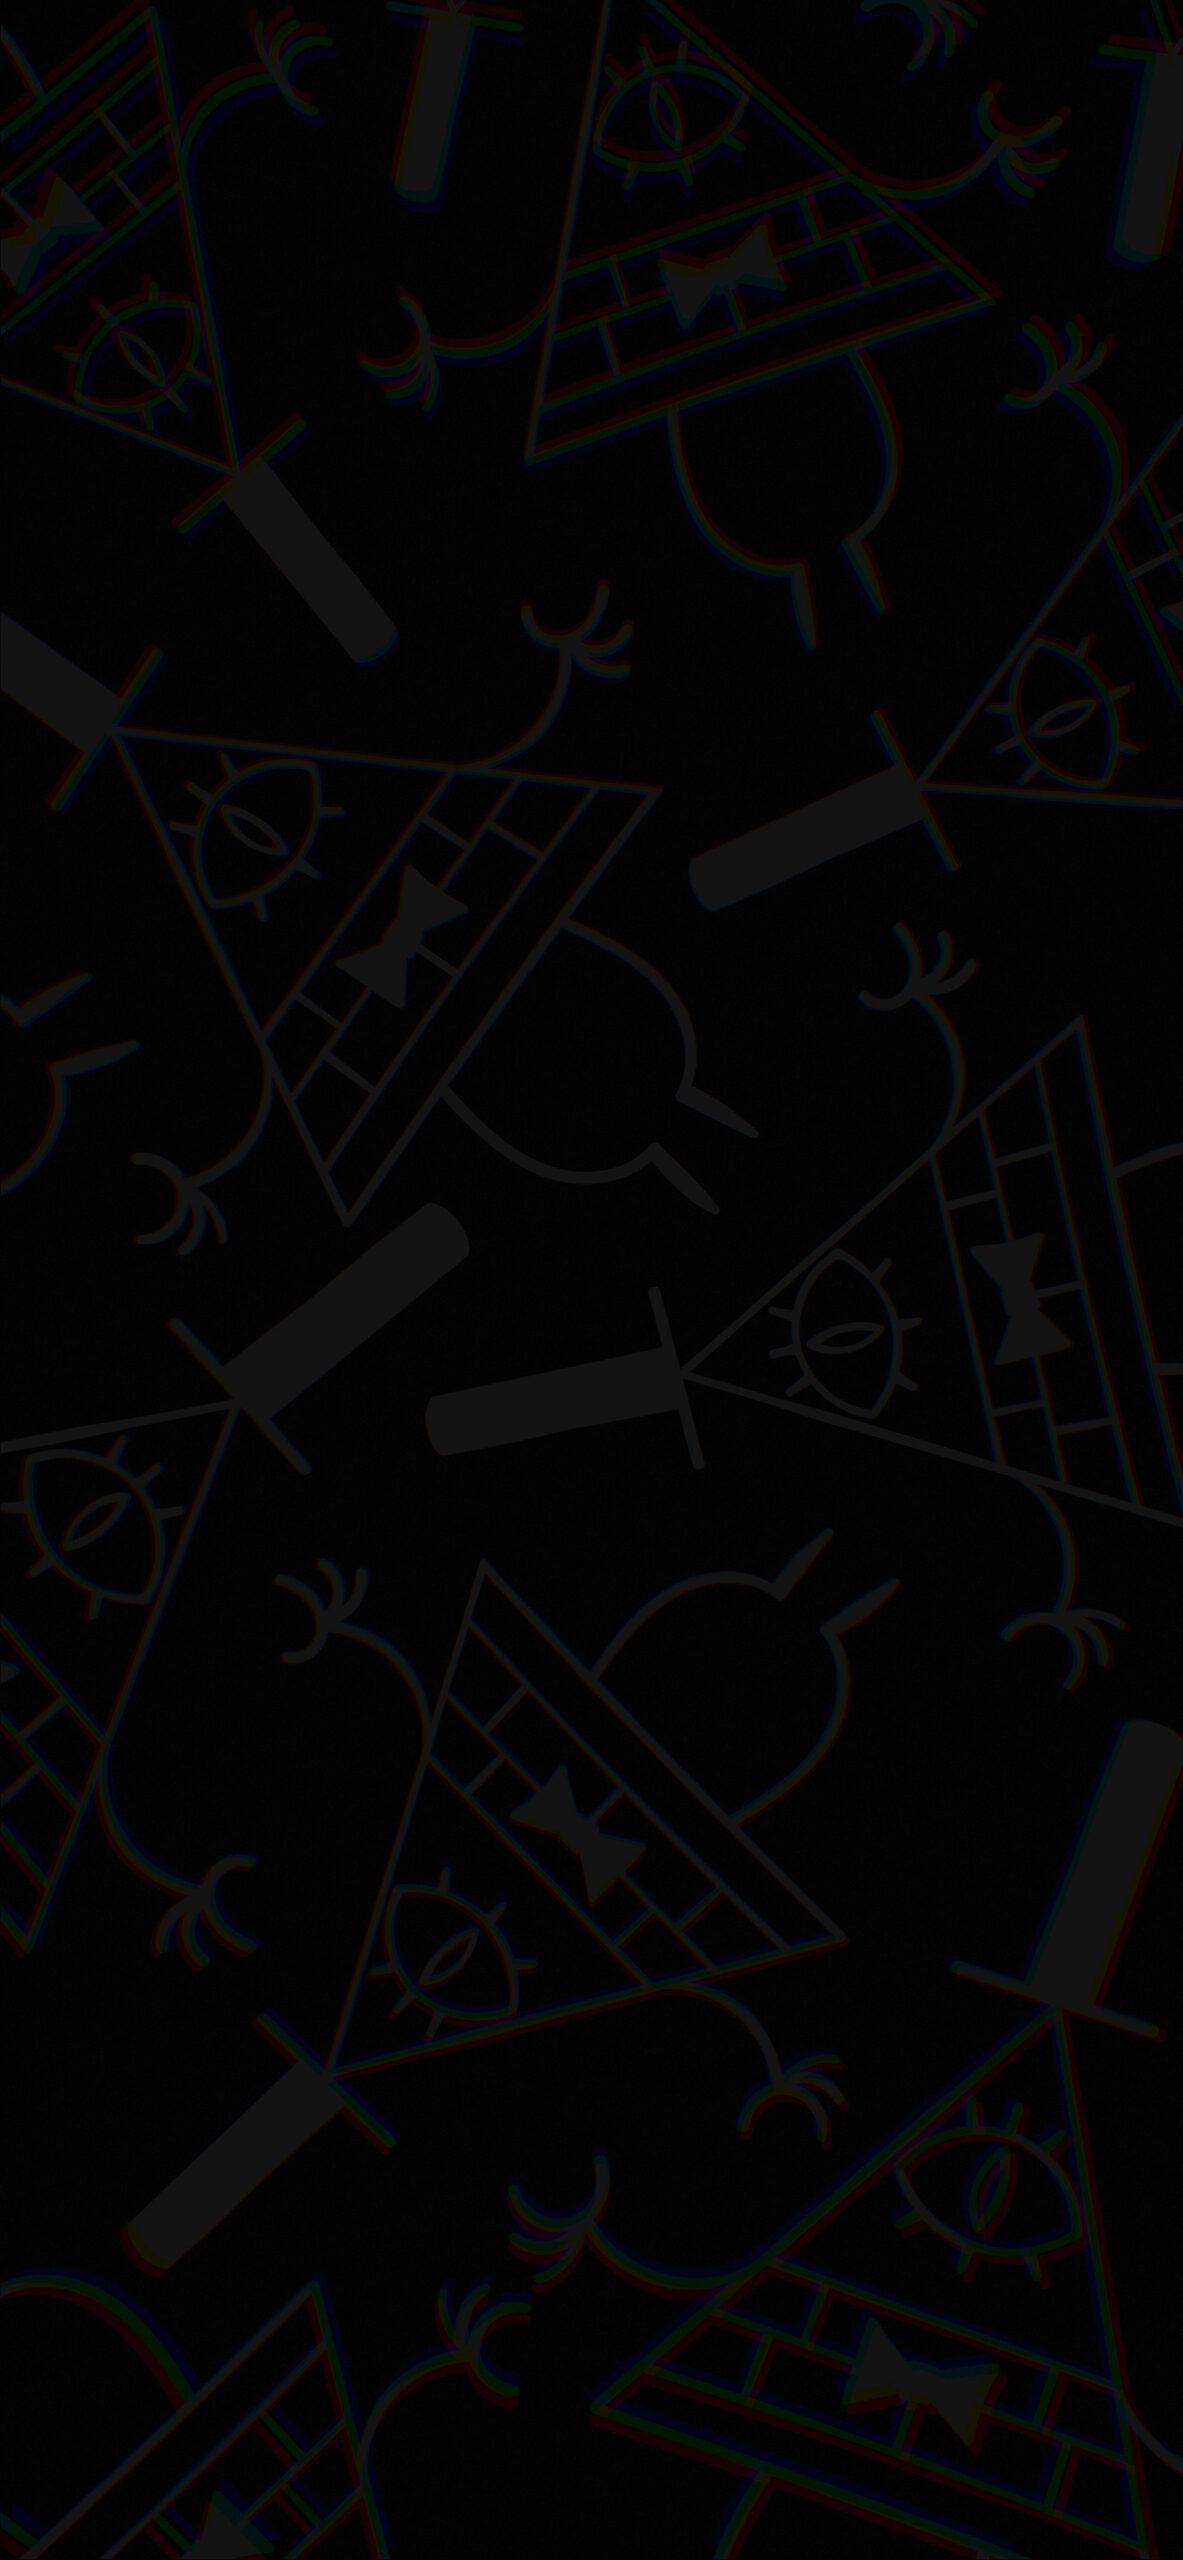 gravity falls bill cipher deep black background